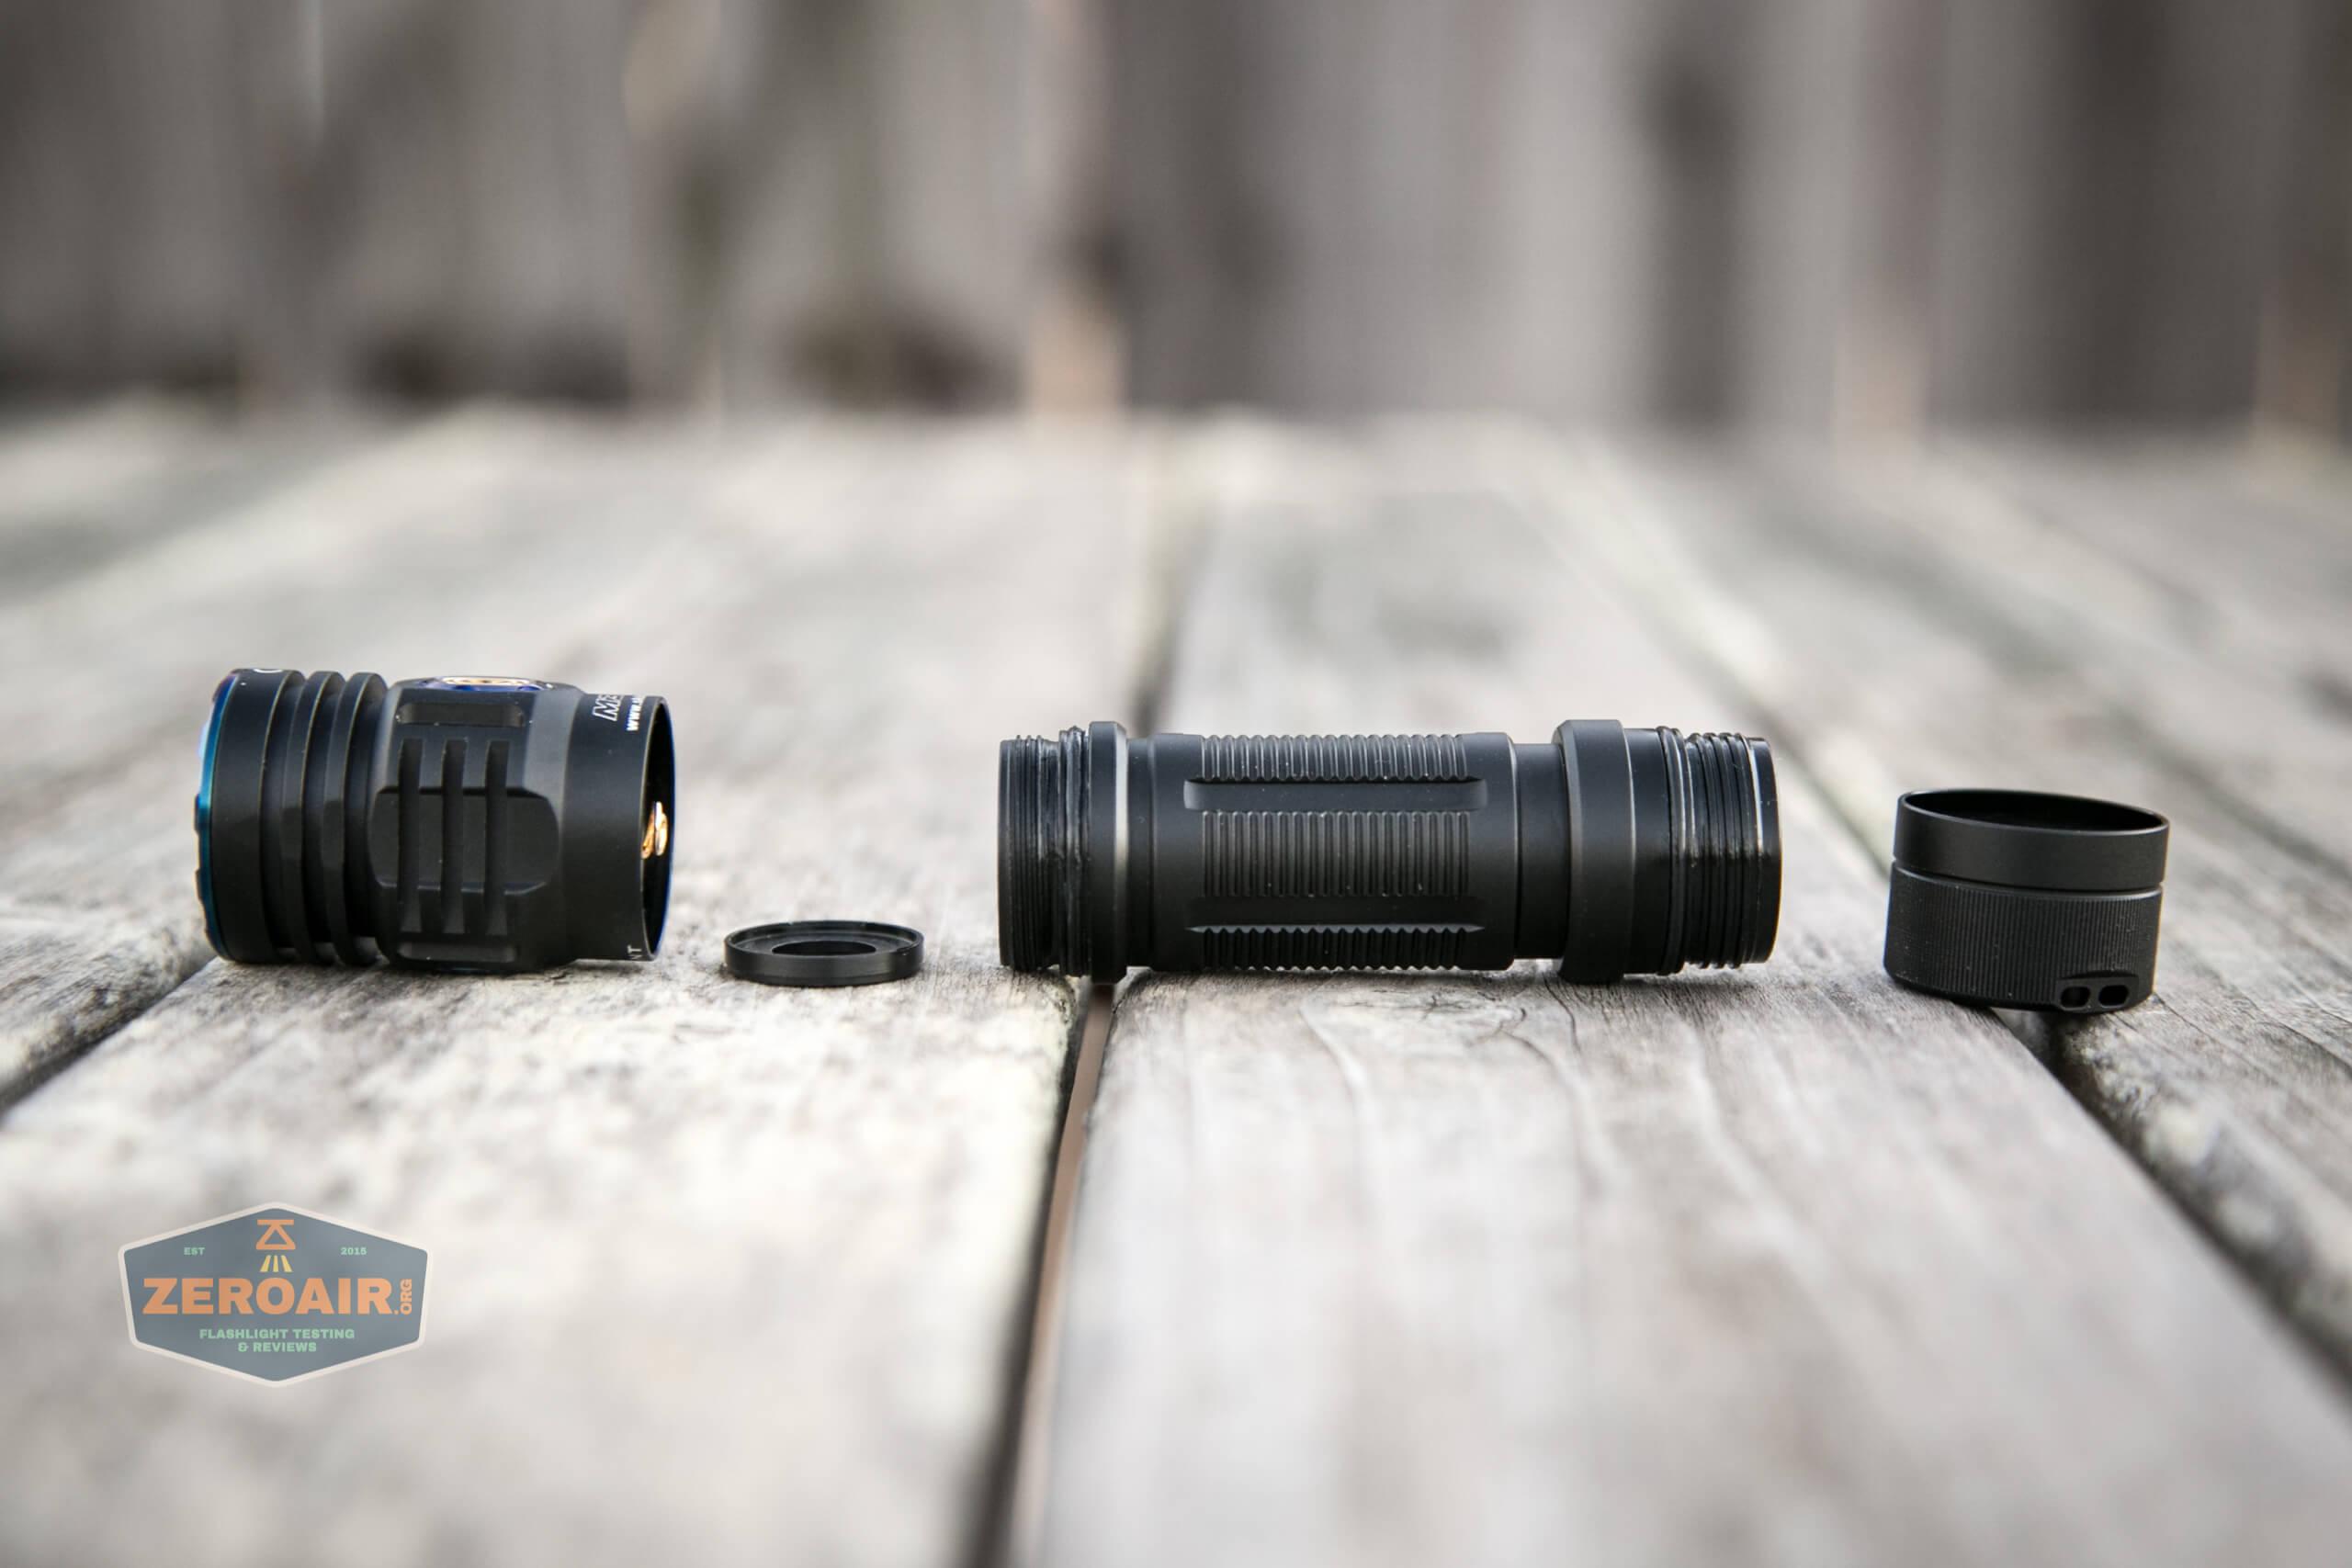 skilhunt m300 18650 flashlight disassembled